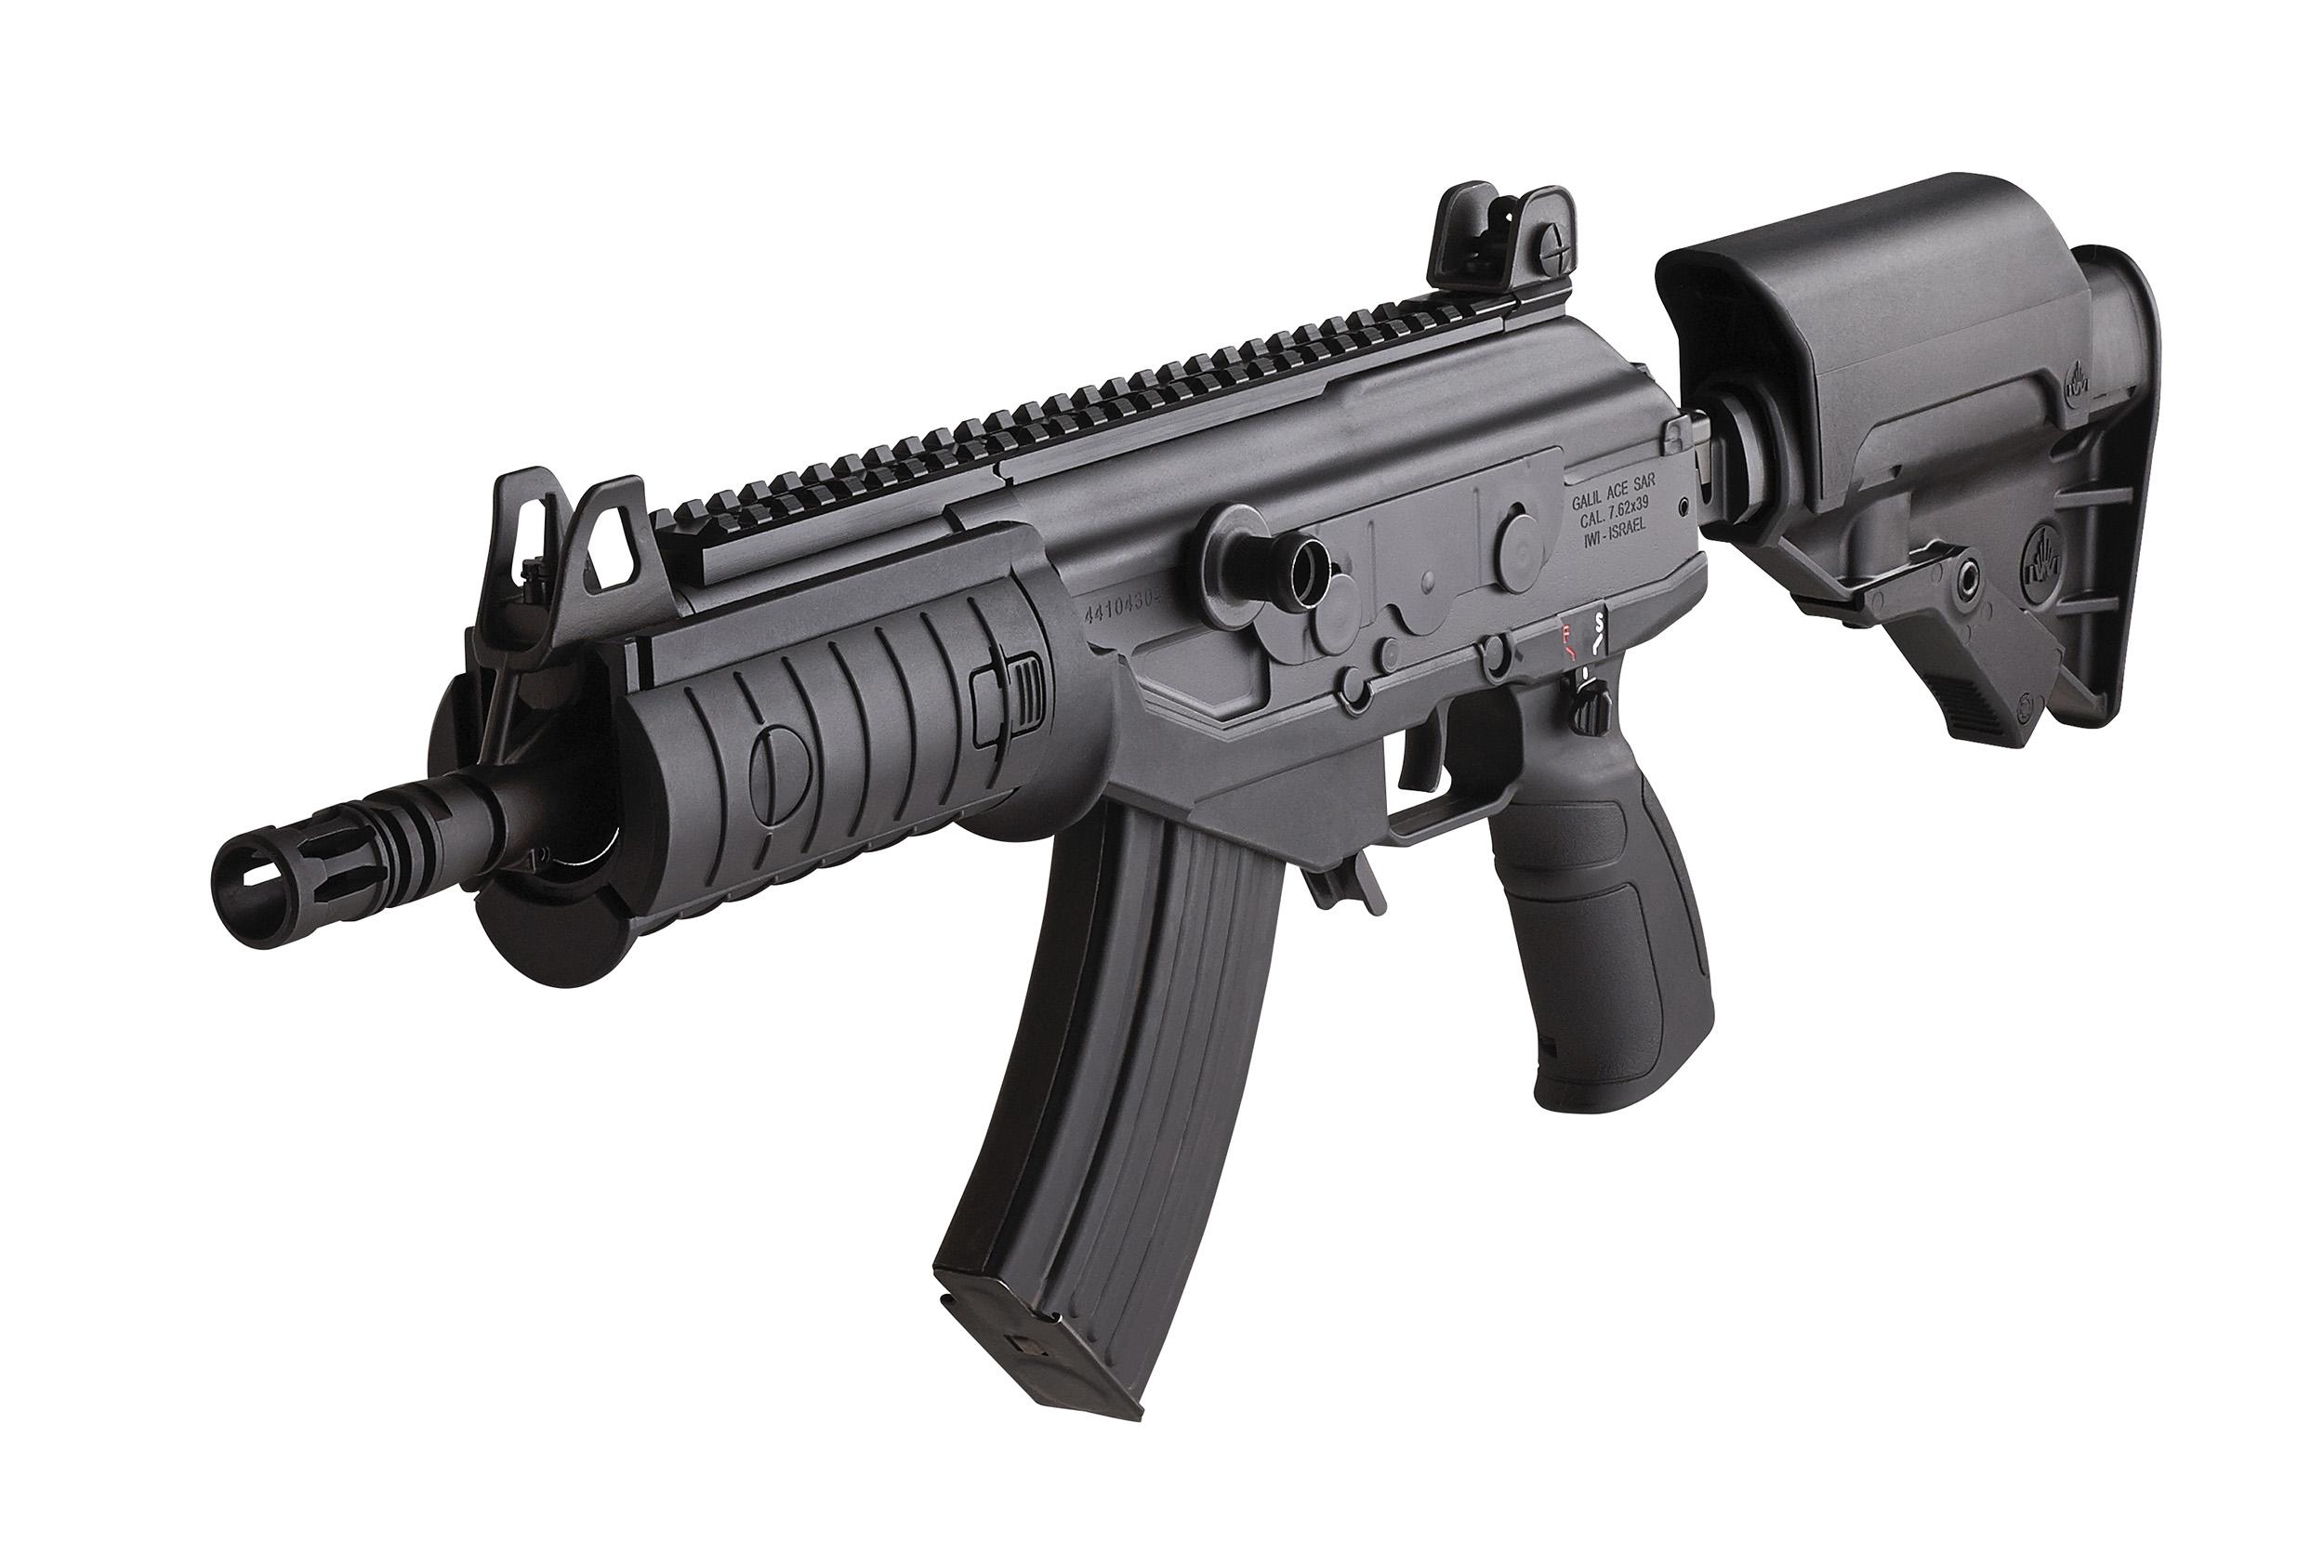 IWI - Israel Weapon Industries GALIL ACE SBR 7.62 X 39MM